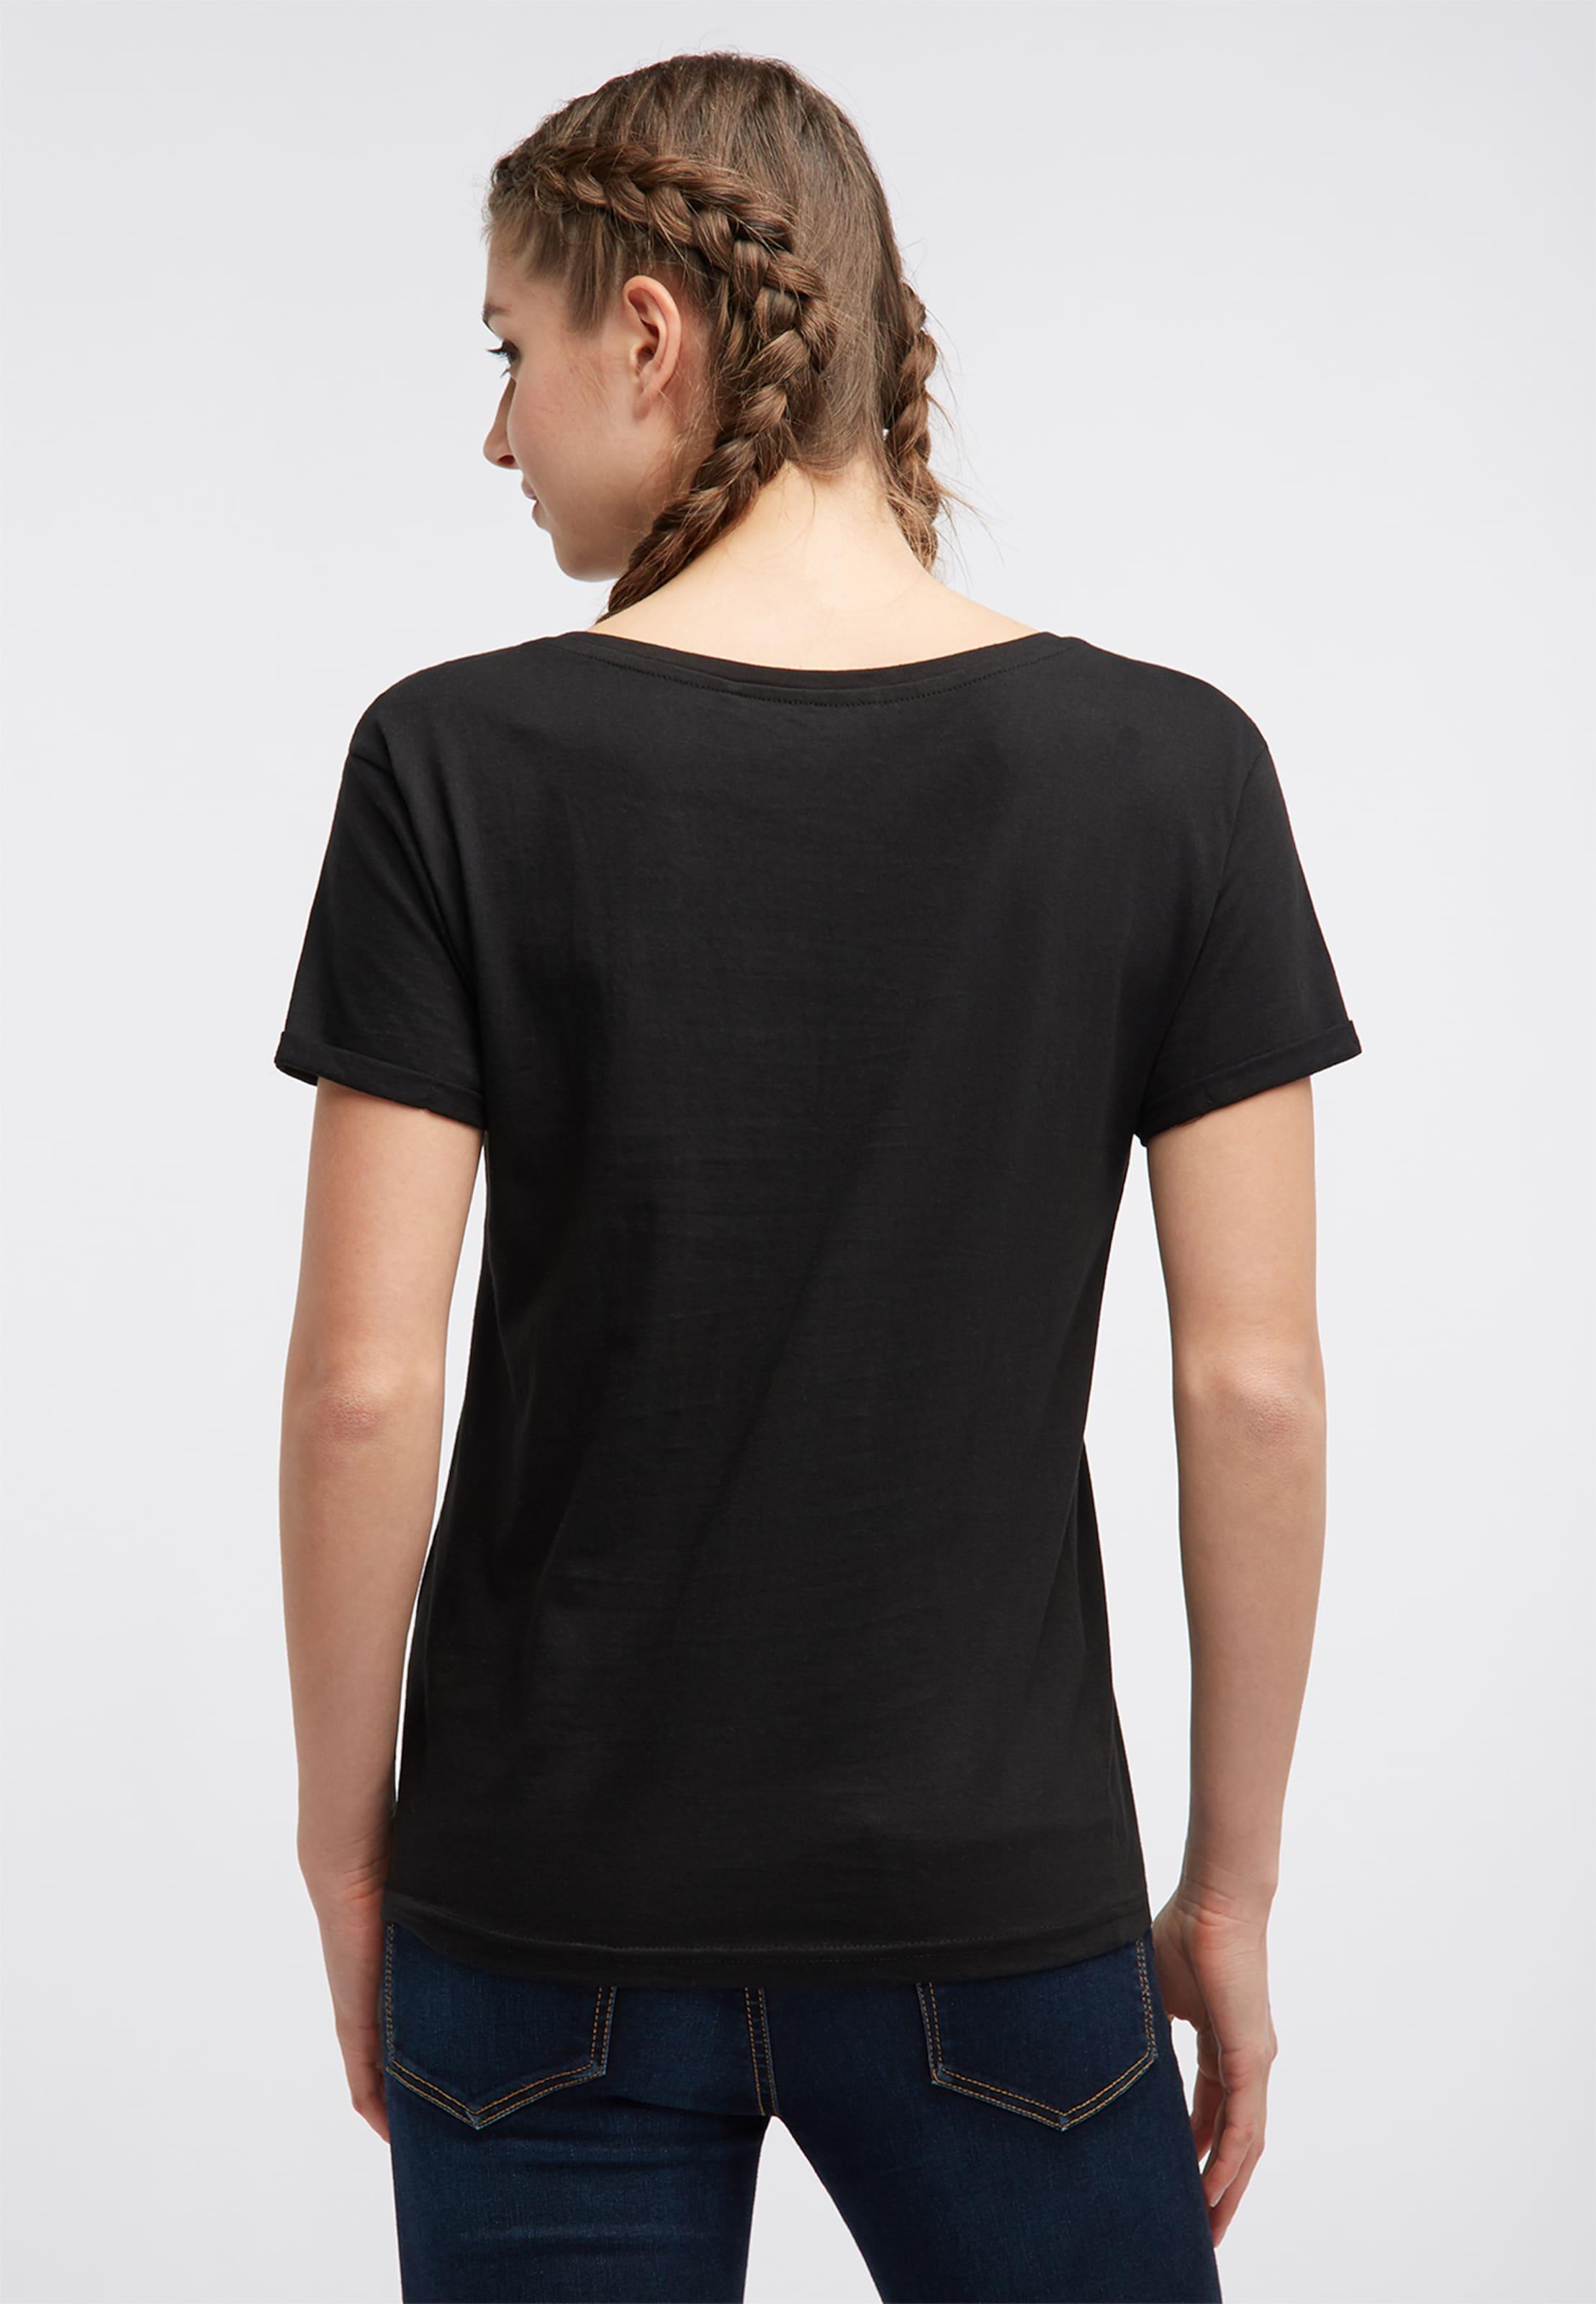 shirt Mymo NoirBlanc shirt En T En NoirBlanc Mymo T Ib7gfyvY6